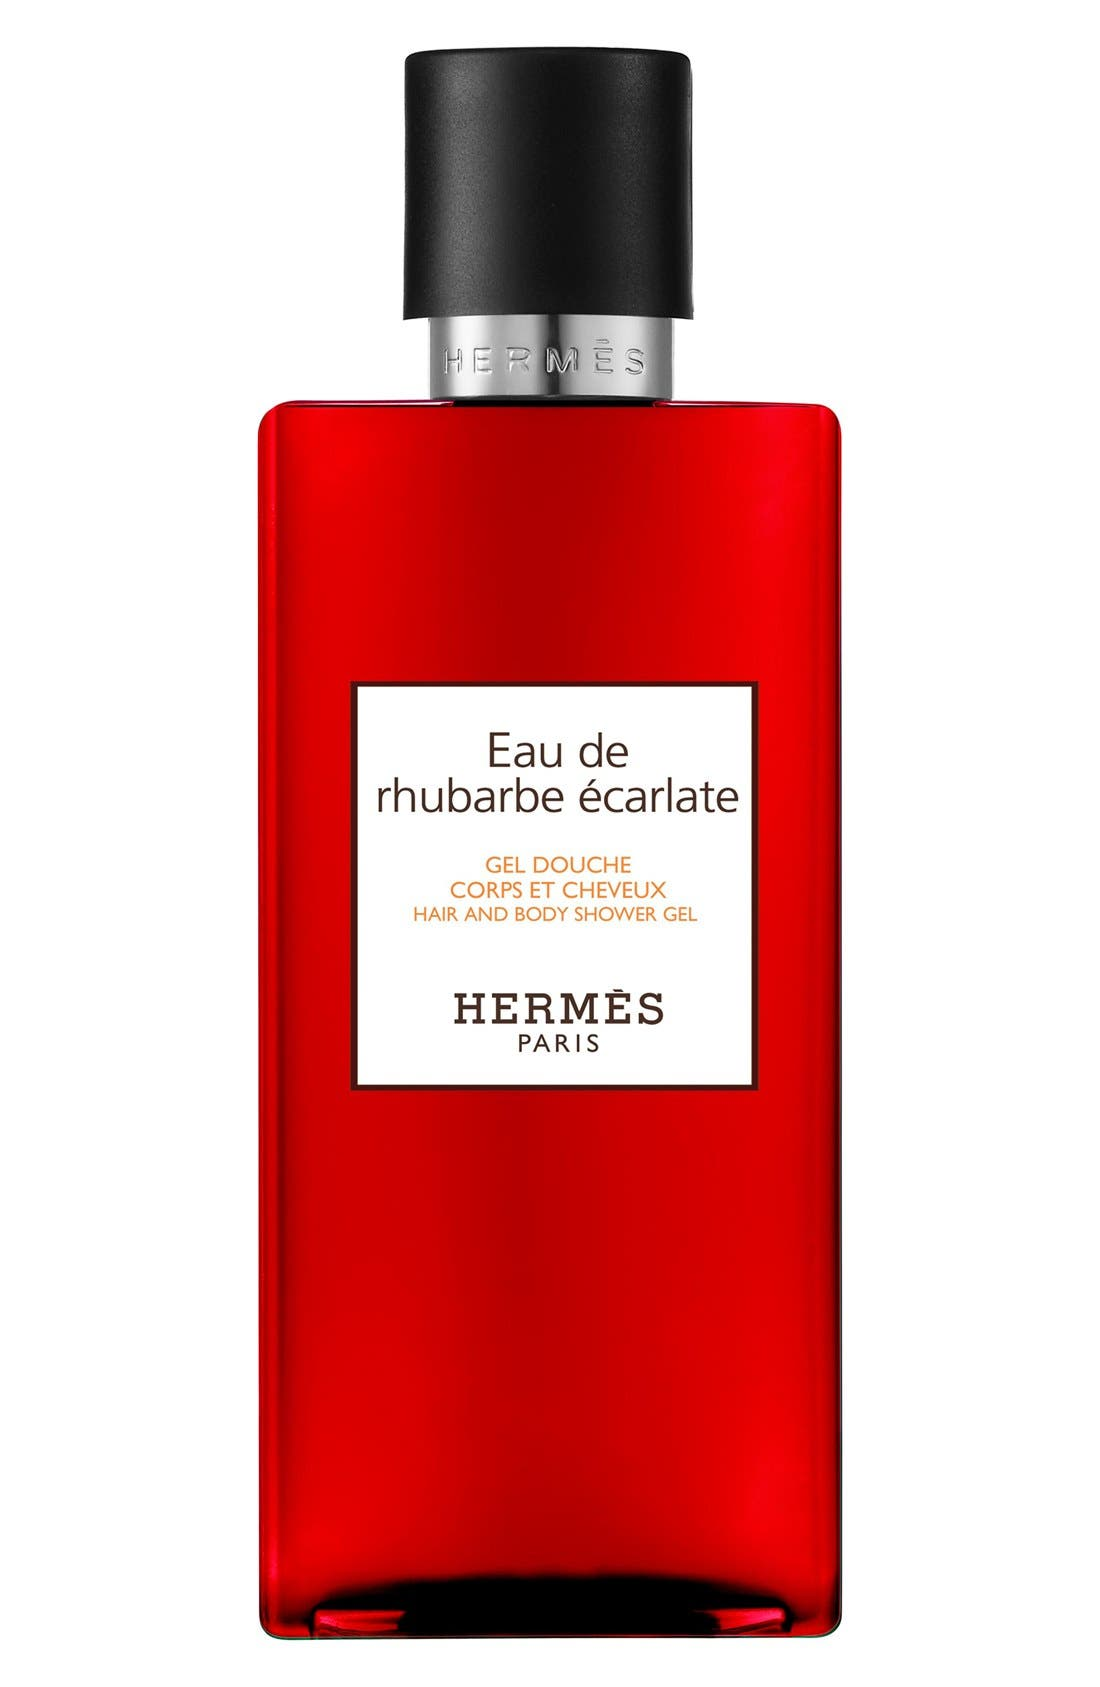 Hermès Eau de Rhubarbe Écarlate - Hair and body shower gel